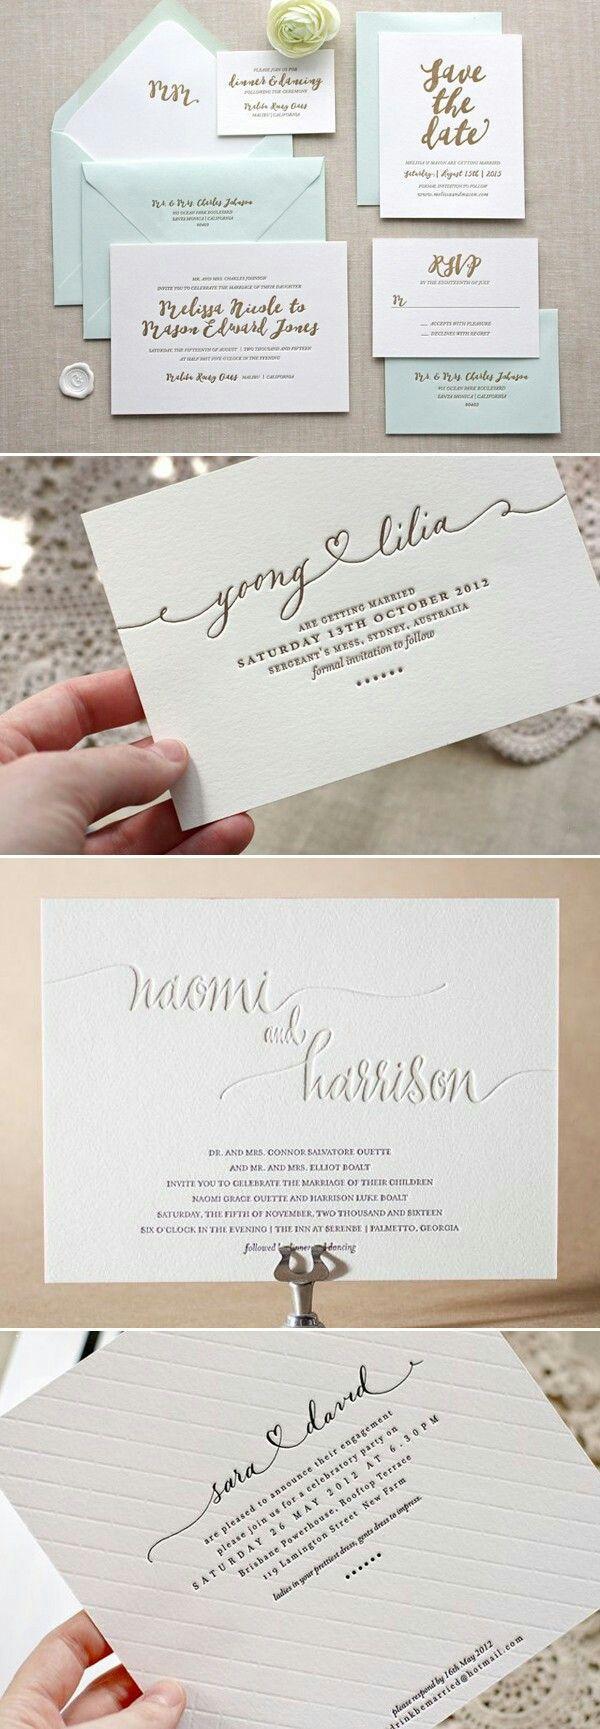 Bride to Be Reading Letterpress wedding